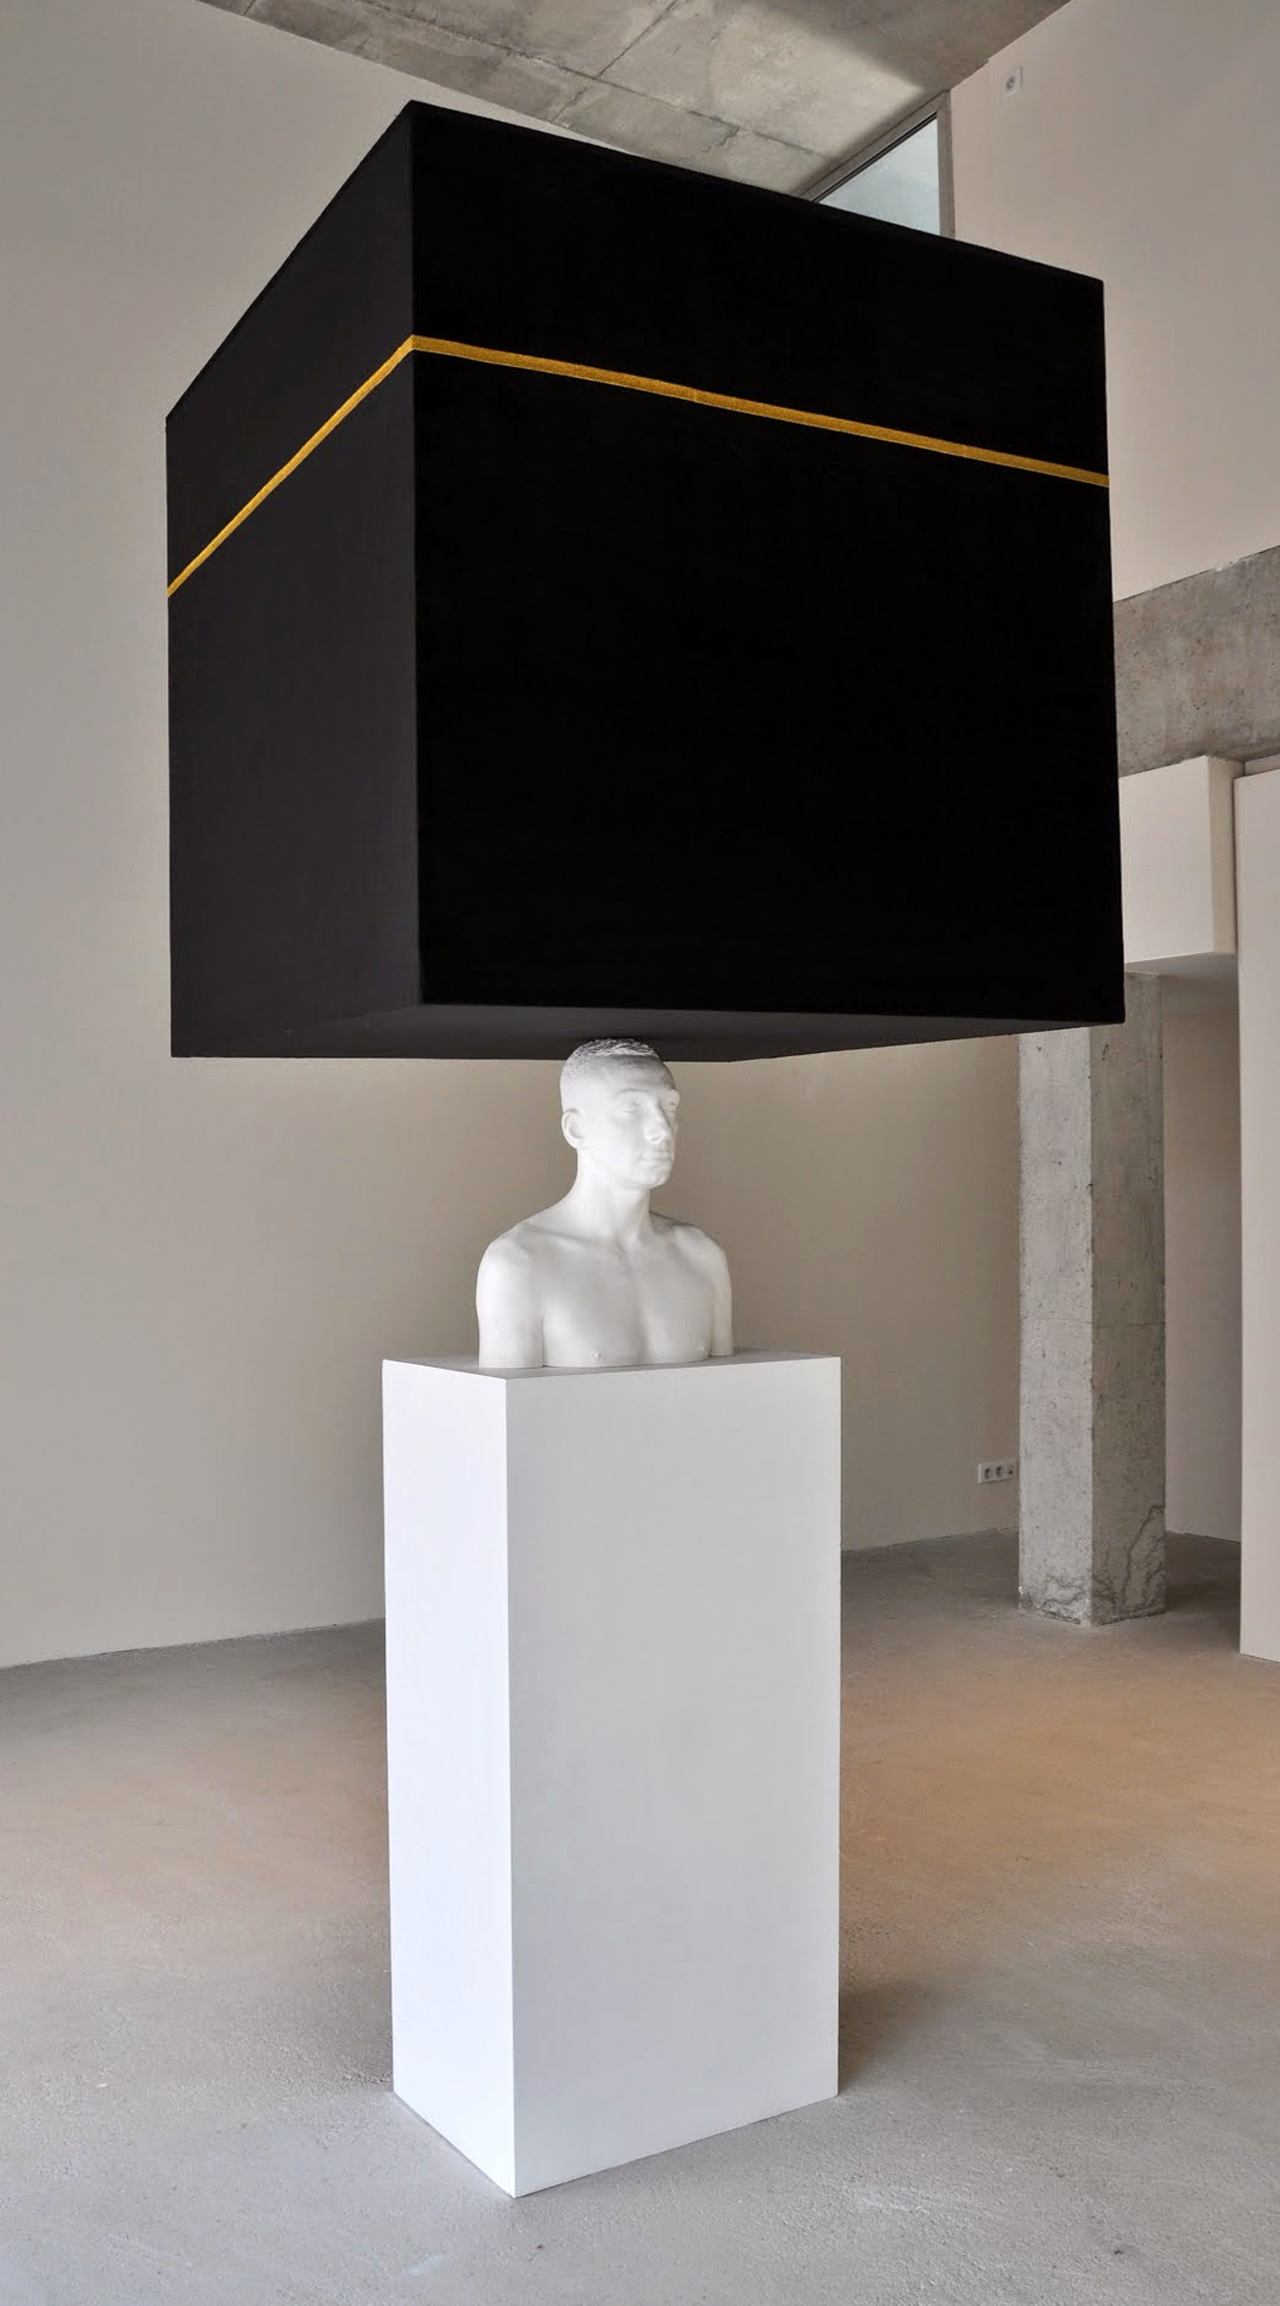 contemporary art furniture. Mehdi Georges Lahlou\u0027s \u201cEquilibre à La Kaaba\u201d (2013) (all Images Courtesy Contemporary Art Furniture T